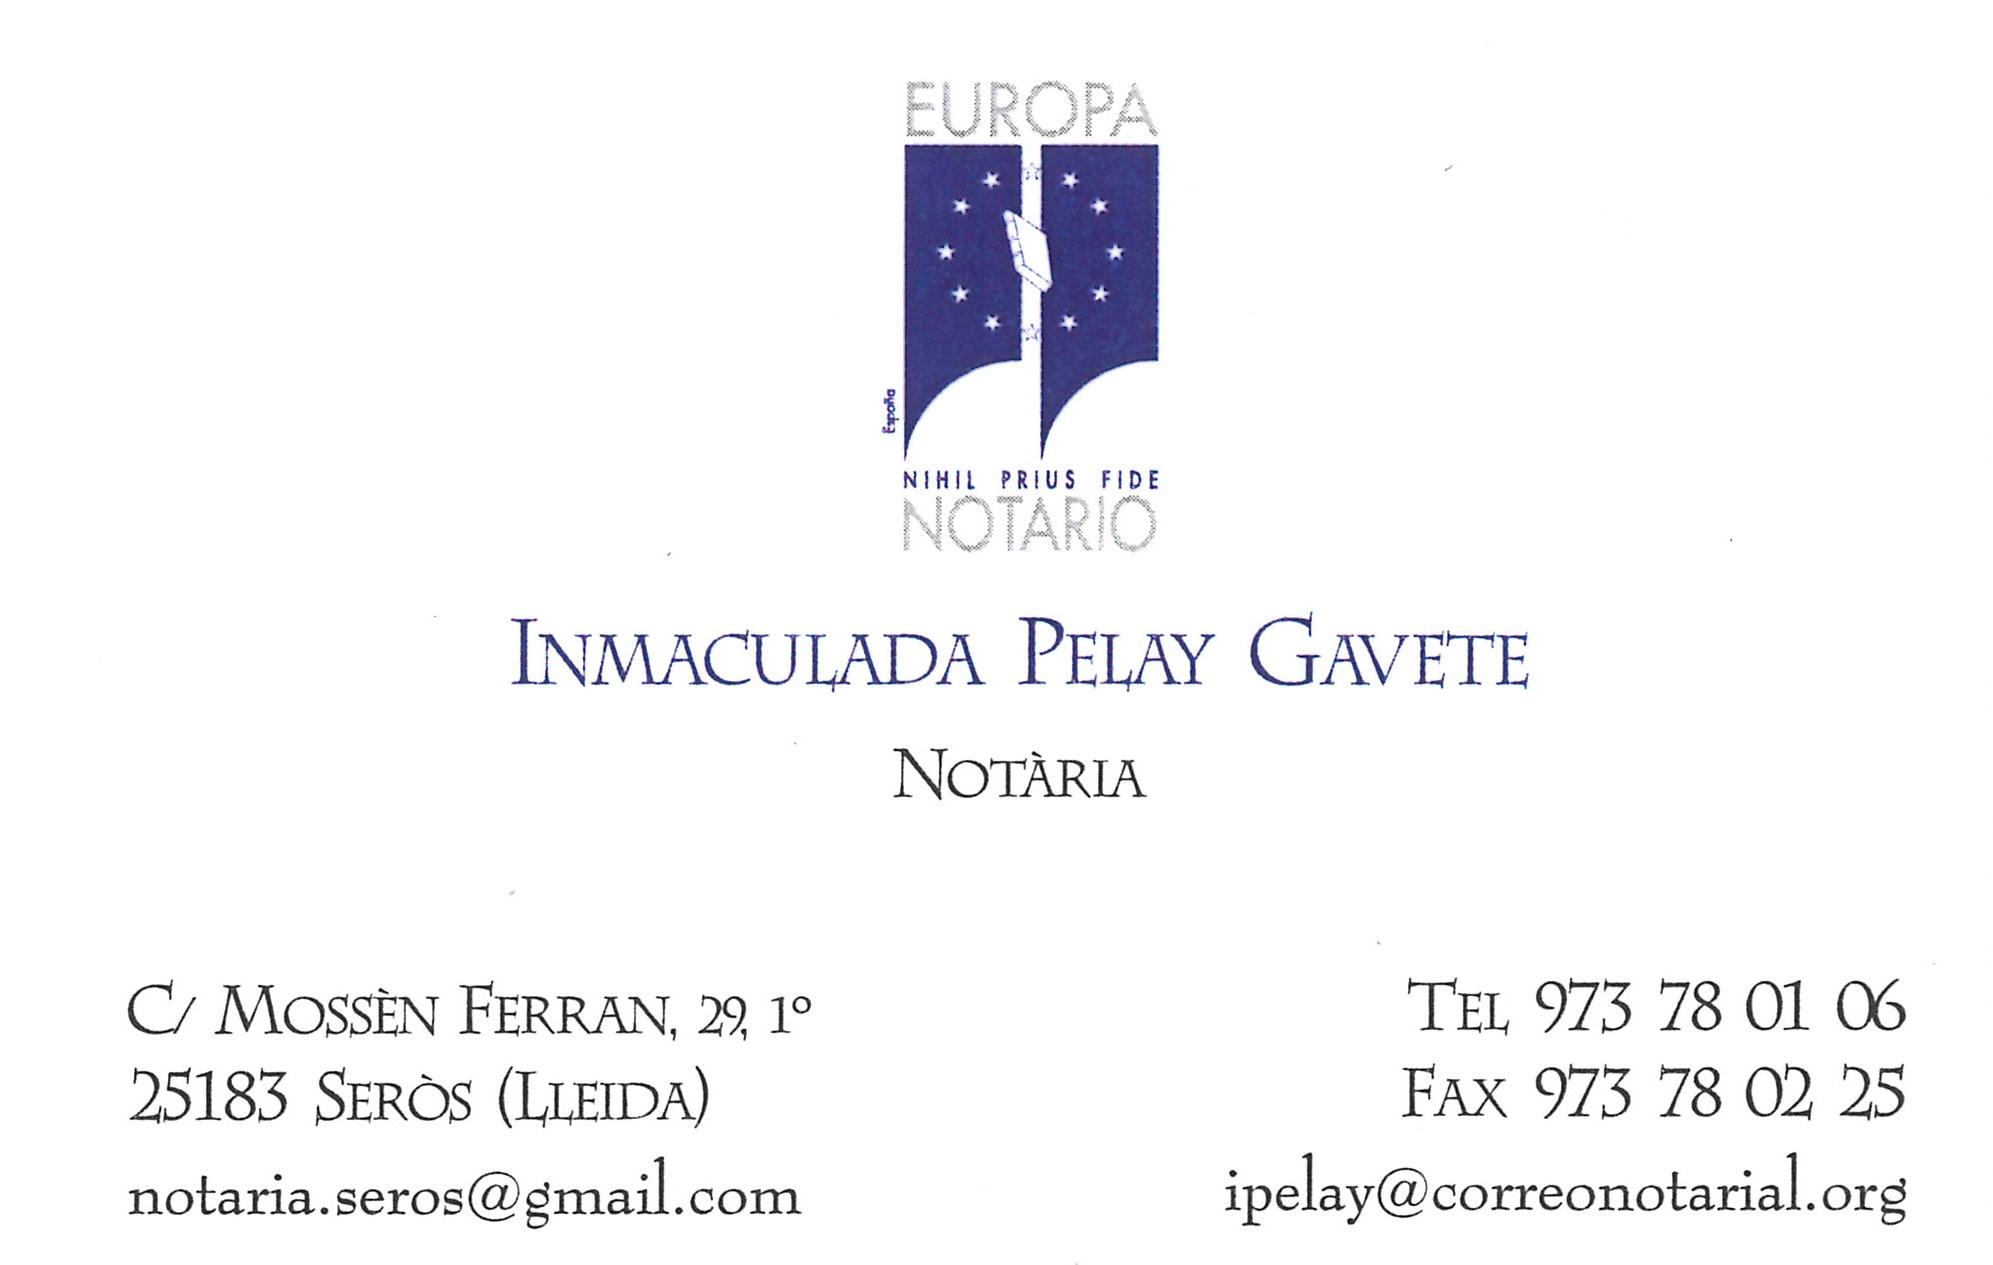 Notaria Inmaculada Pelay Gavete - Notaria de Seròs